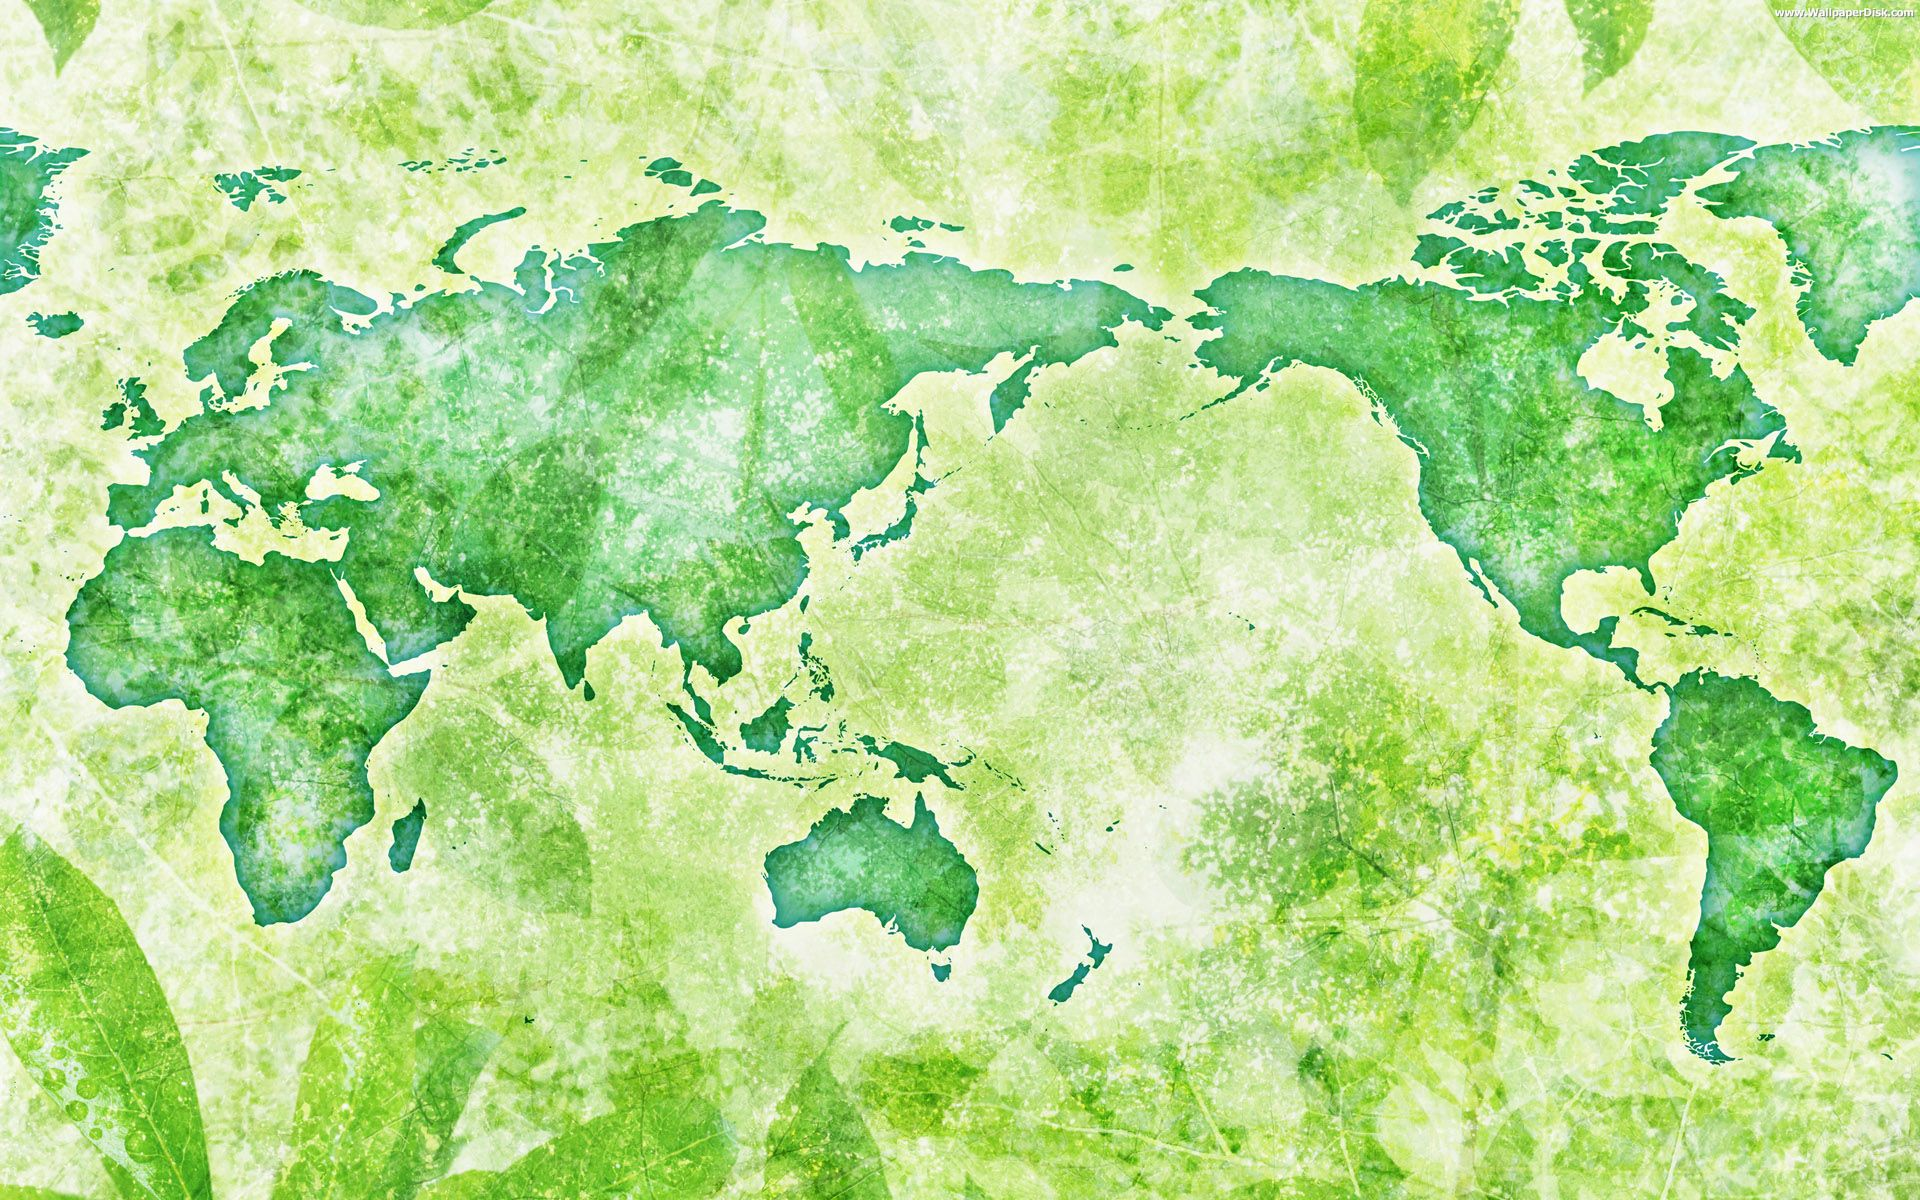 World map wallpaper wallpapersafari for Home wallpaper world map